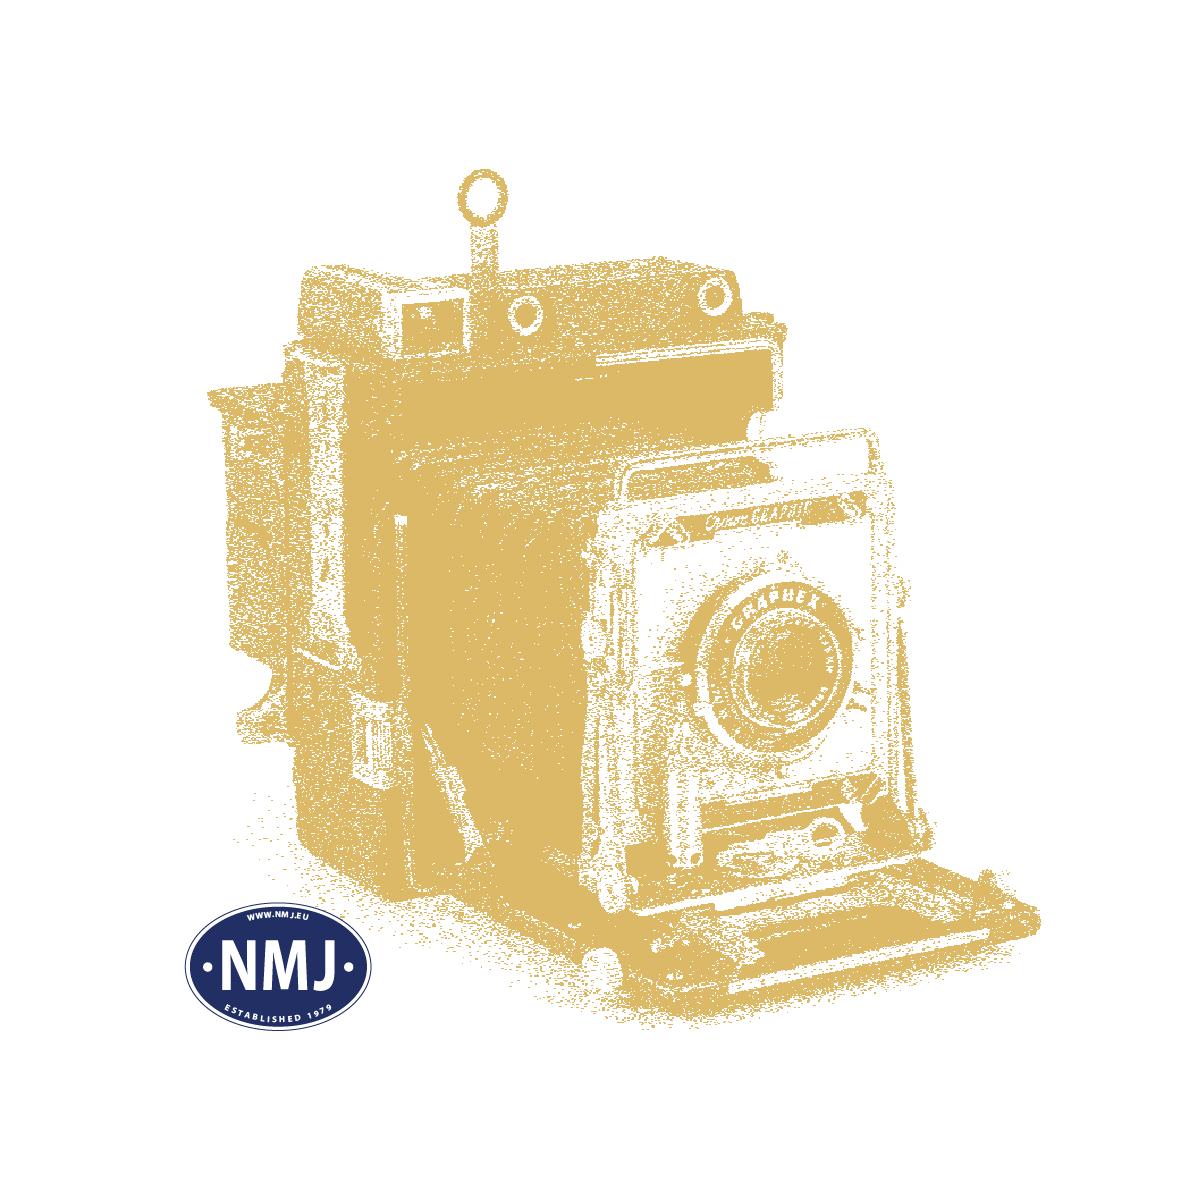 NMJT106.506 - NMJ Topline NSB AB3 25675